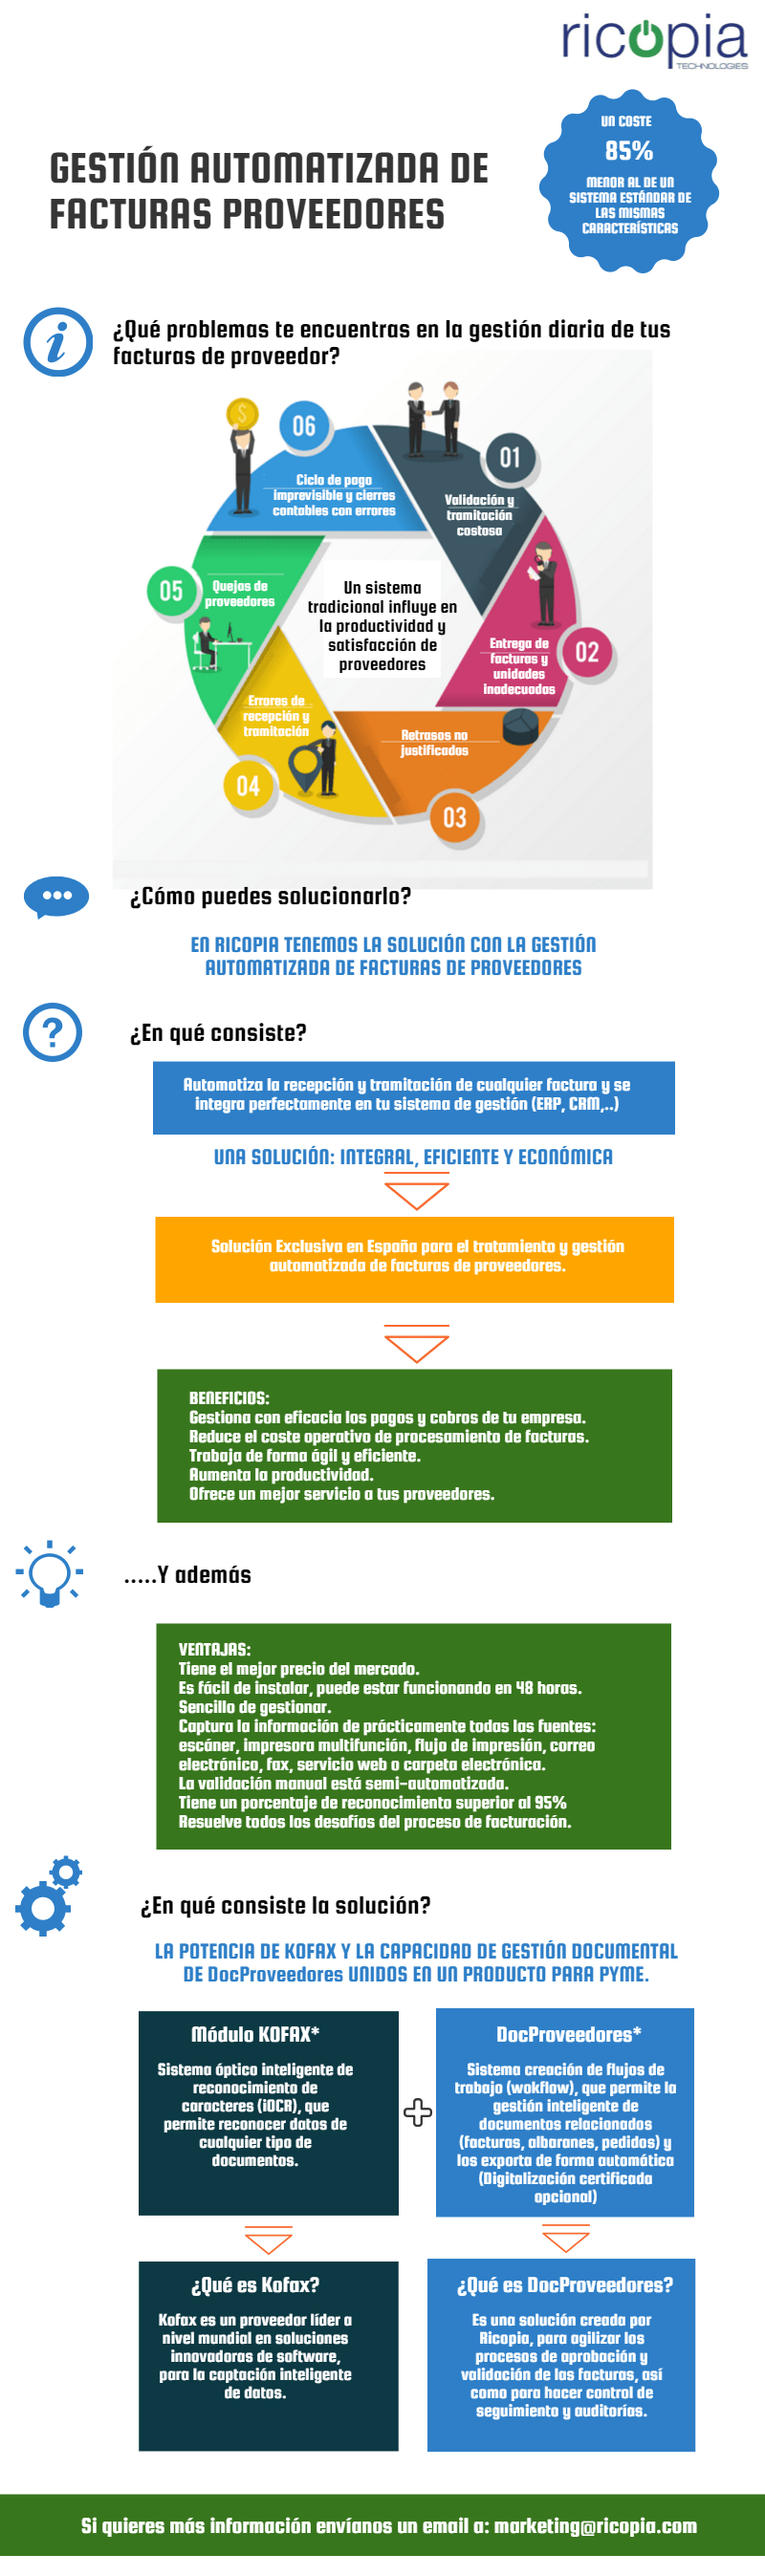 Infografía gestión automatizada de facturas de proveedor